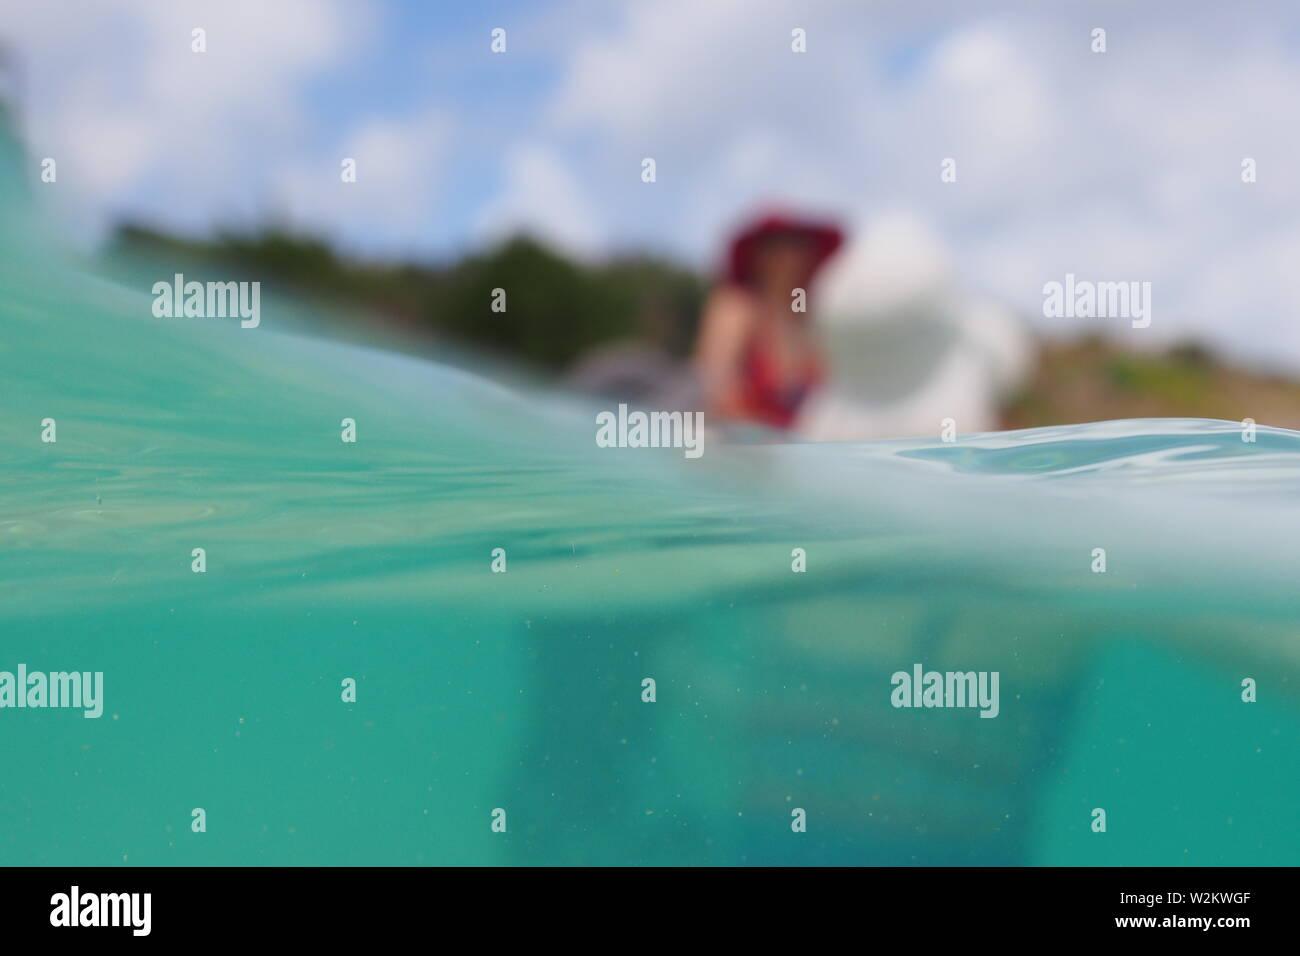 Semi underwater shot of three people swimming, Limestone Bay, Anguilla, BWI. Stock Photo